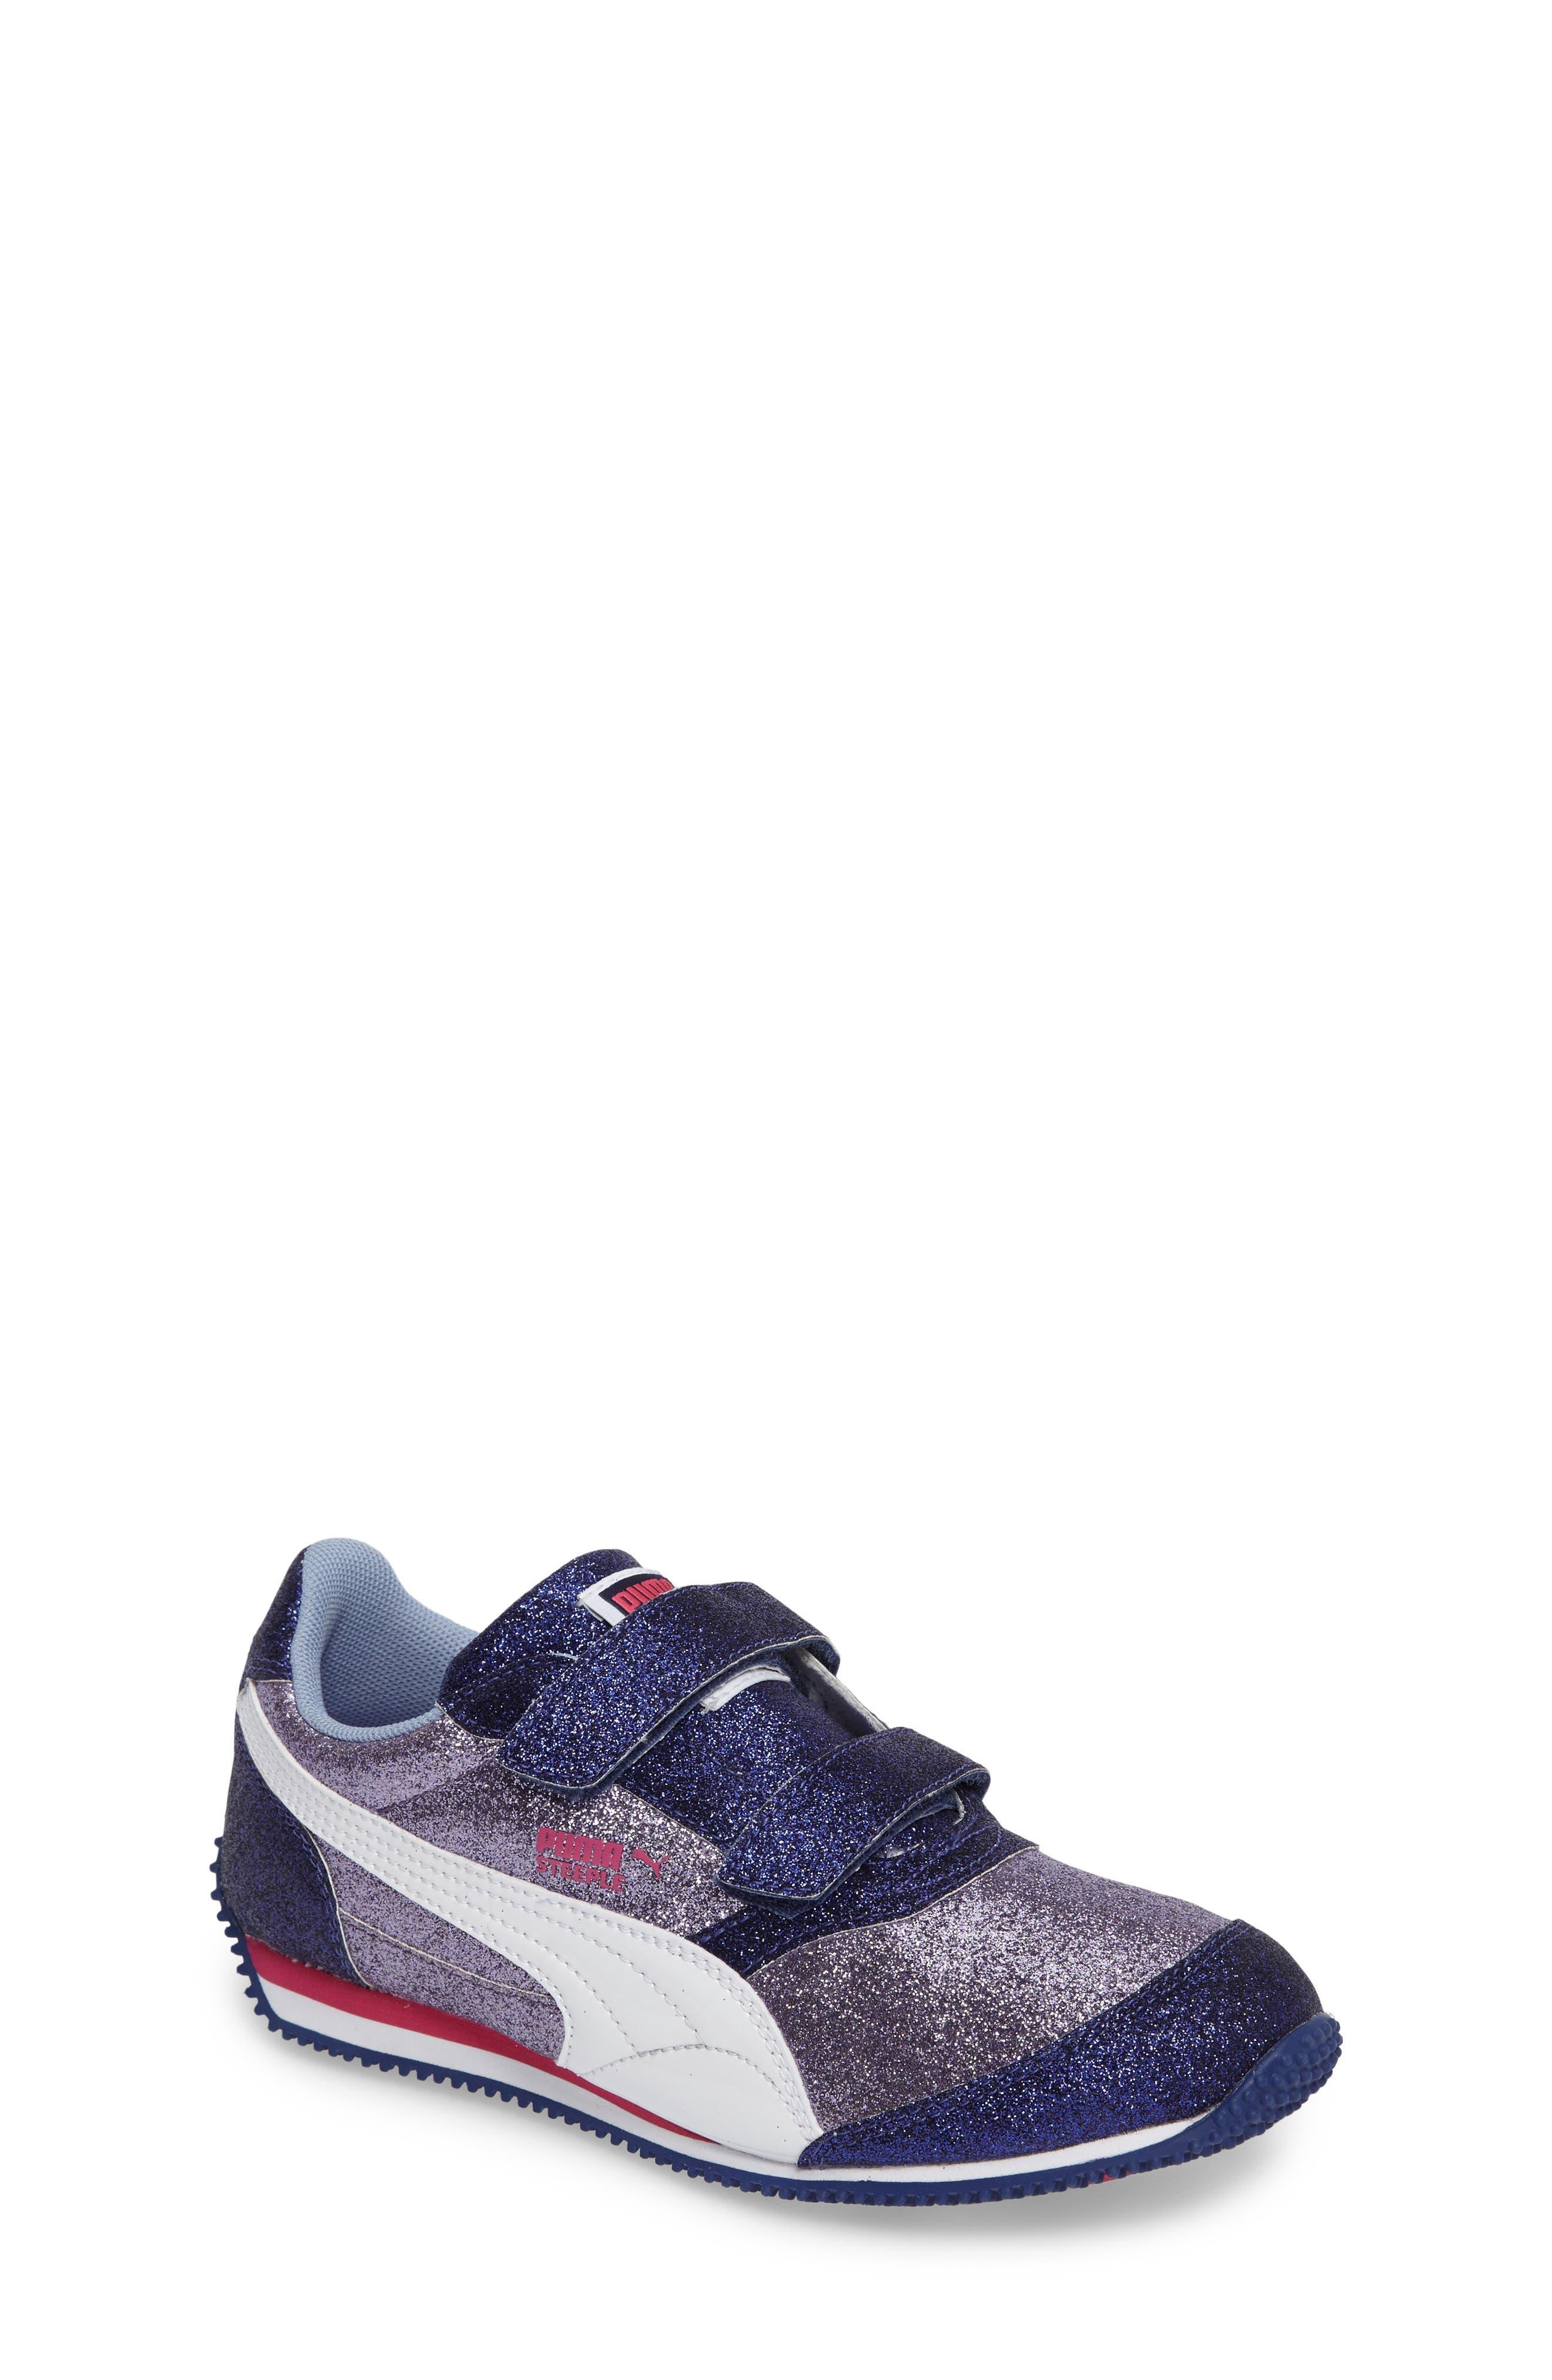 PUMA Steeple Glitz Glam V PS Sneaker